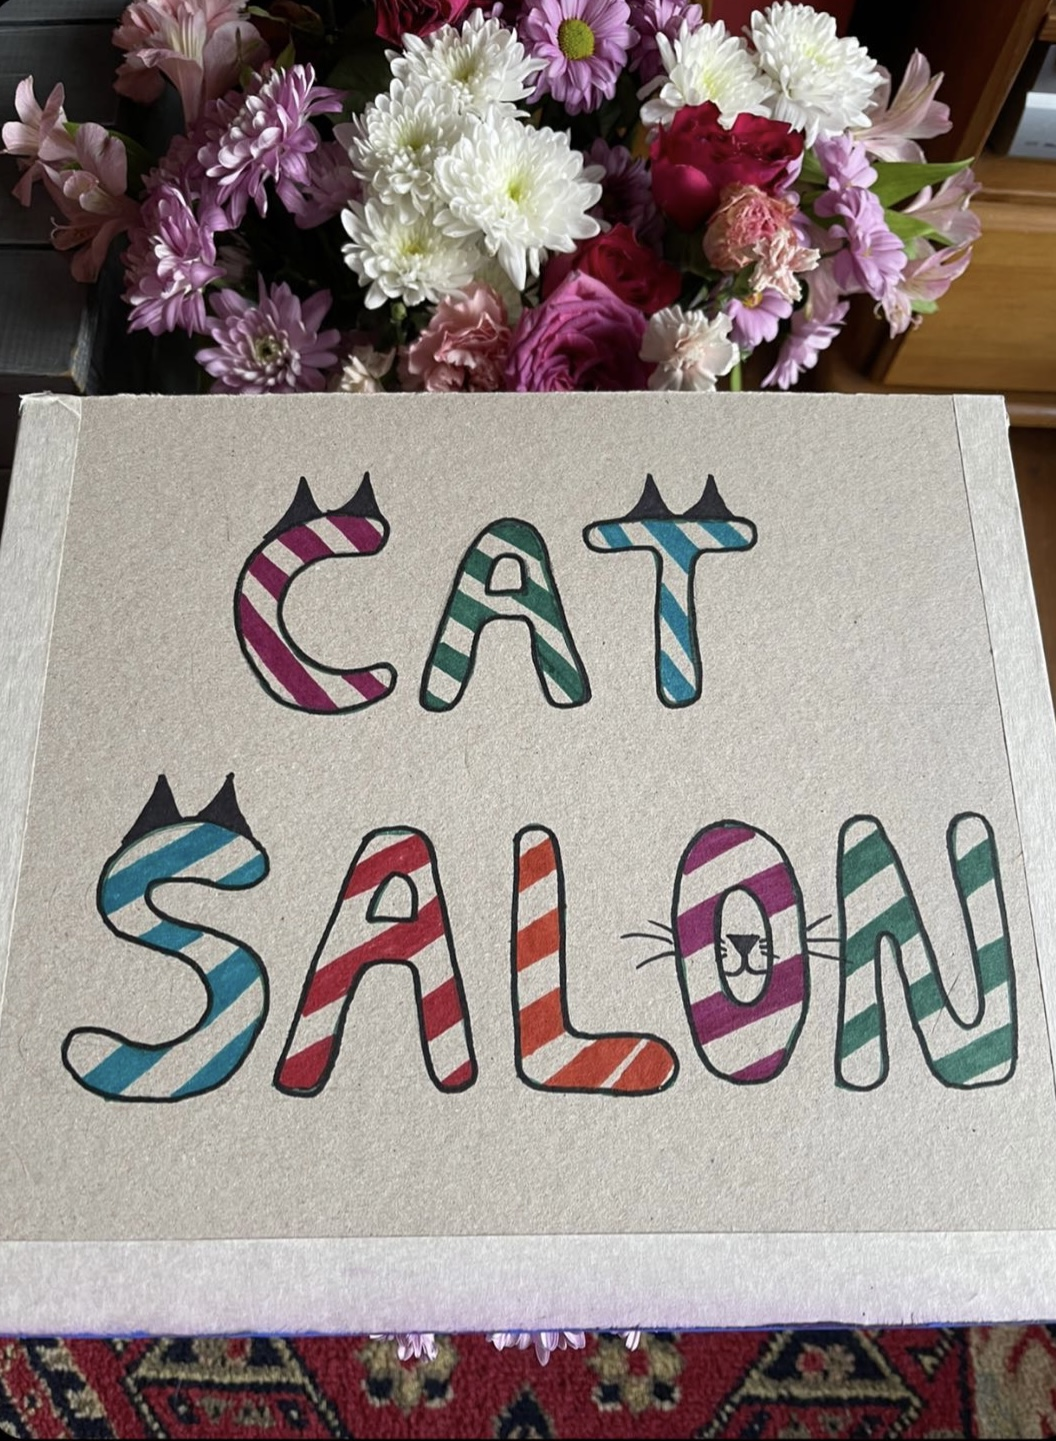 CatSalonFlowers